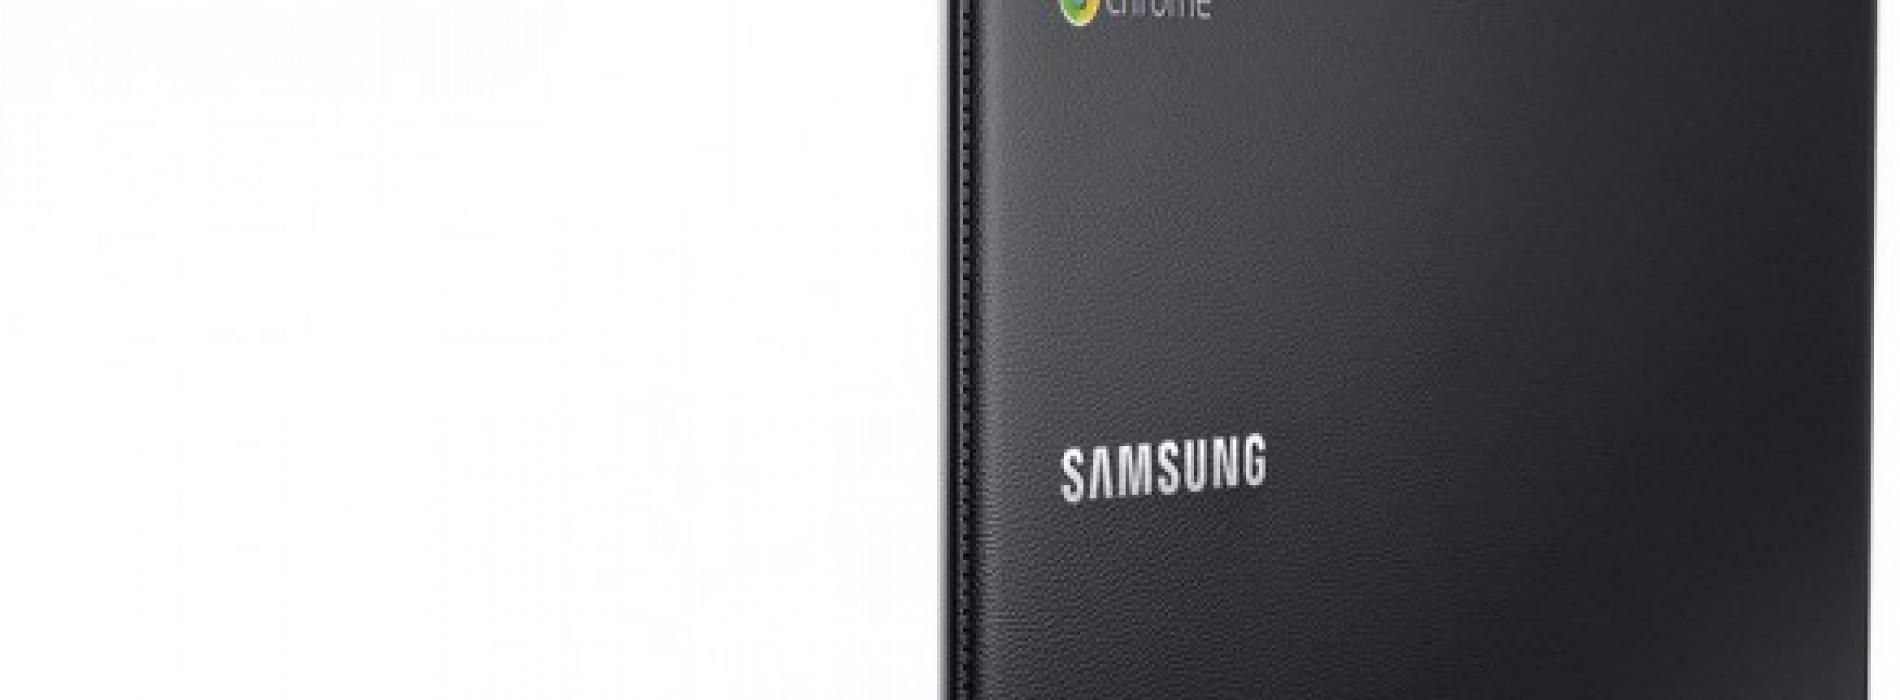 Samsung announces next-generation Chromebook 2 devices